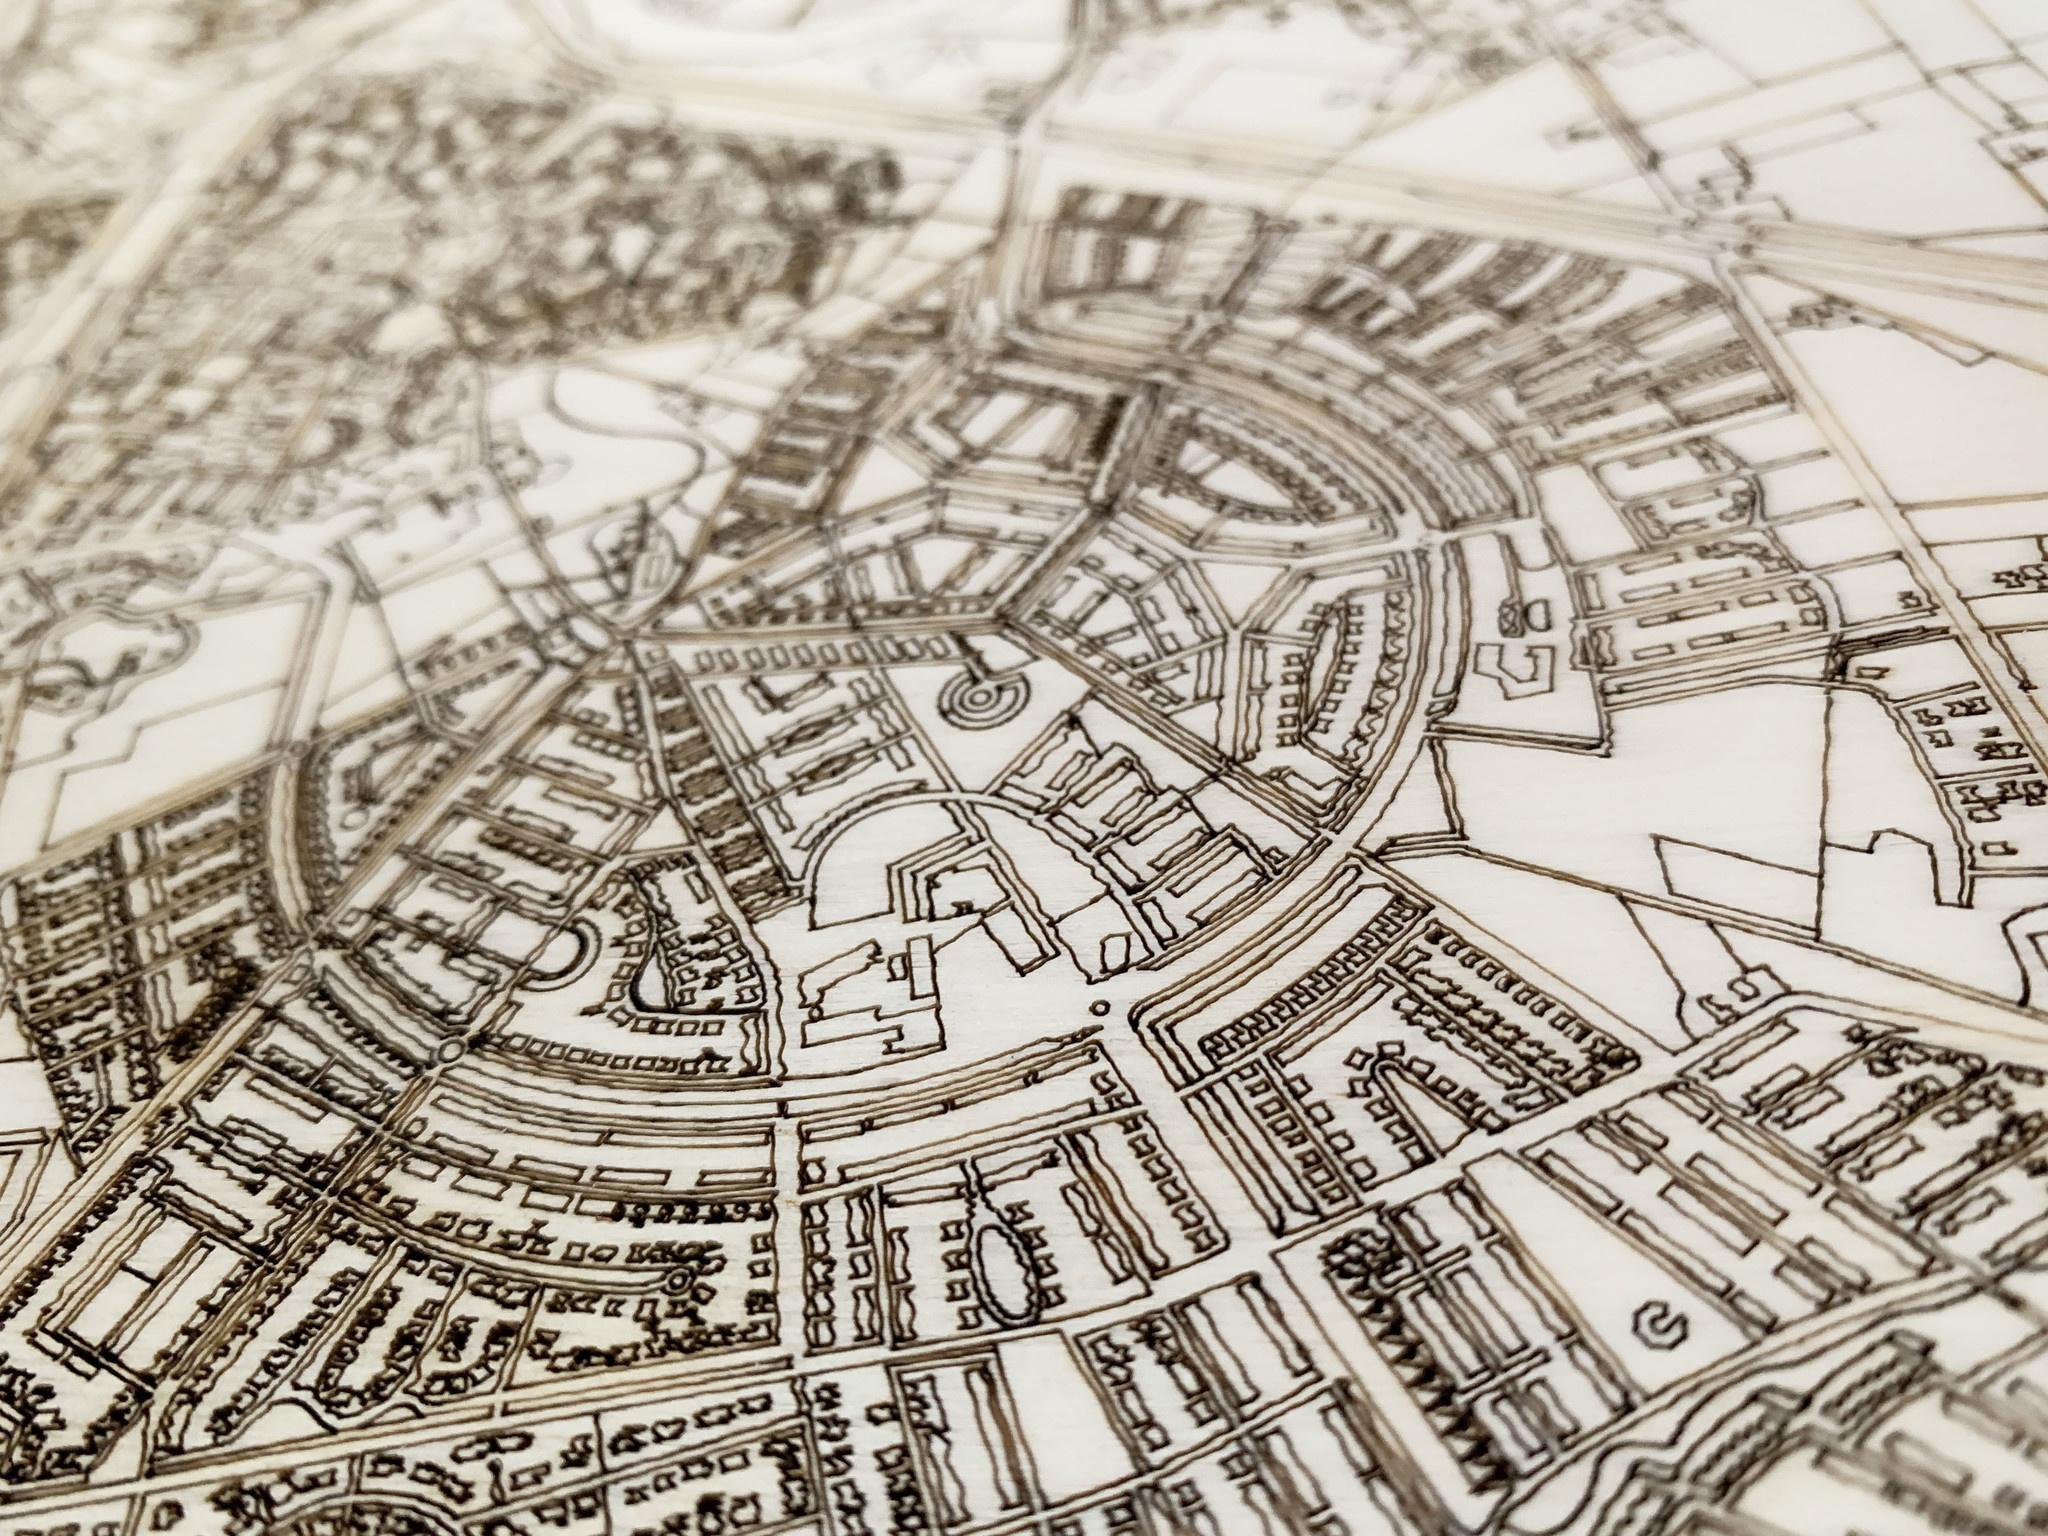 Stadtplan Vlieland | Wanddekoration Holz-4